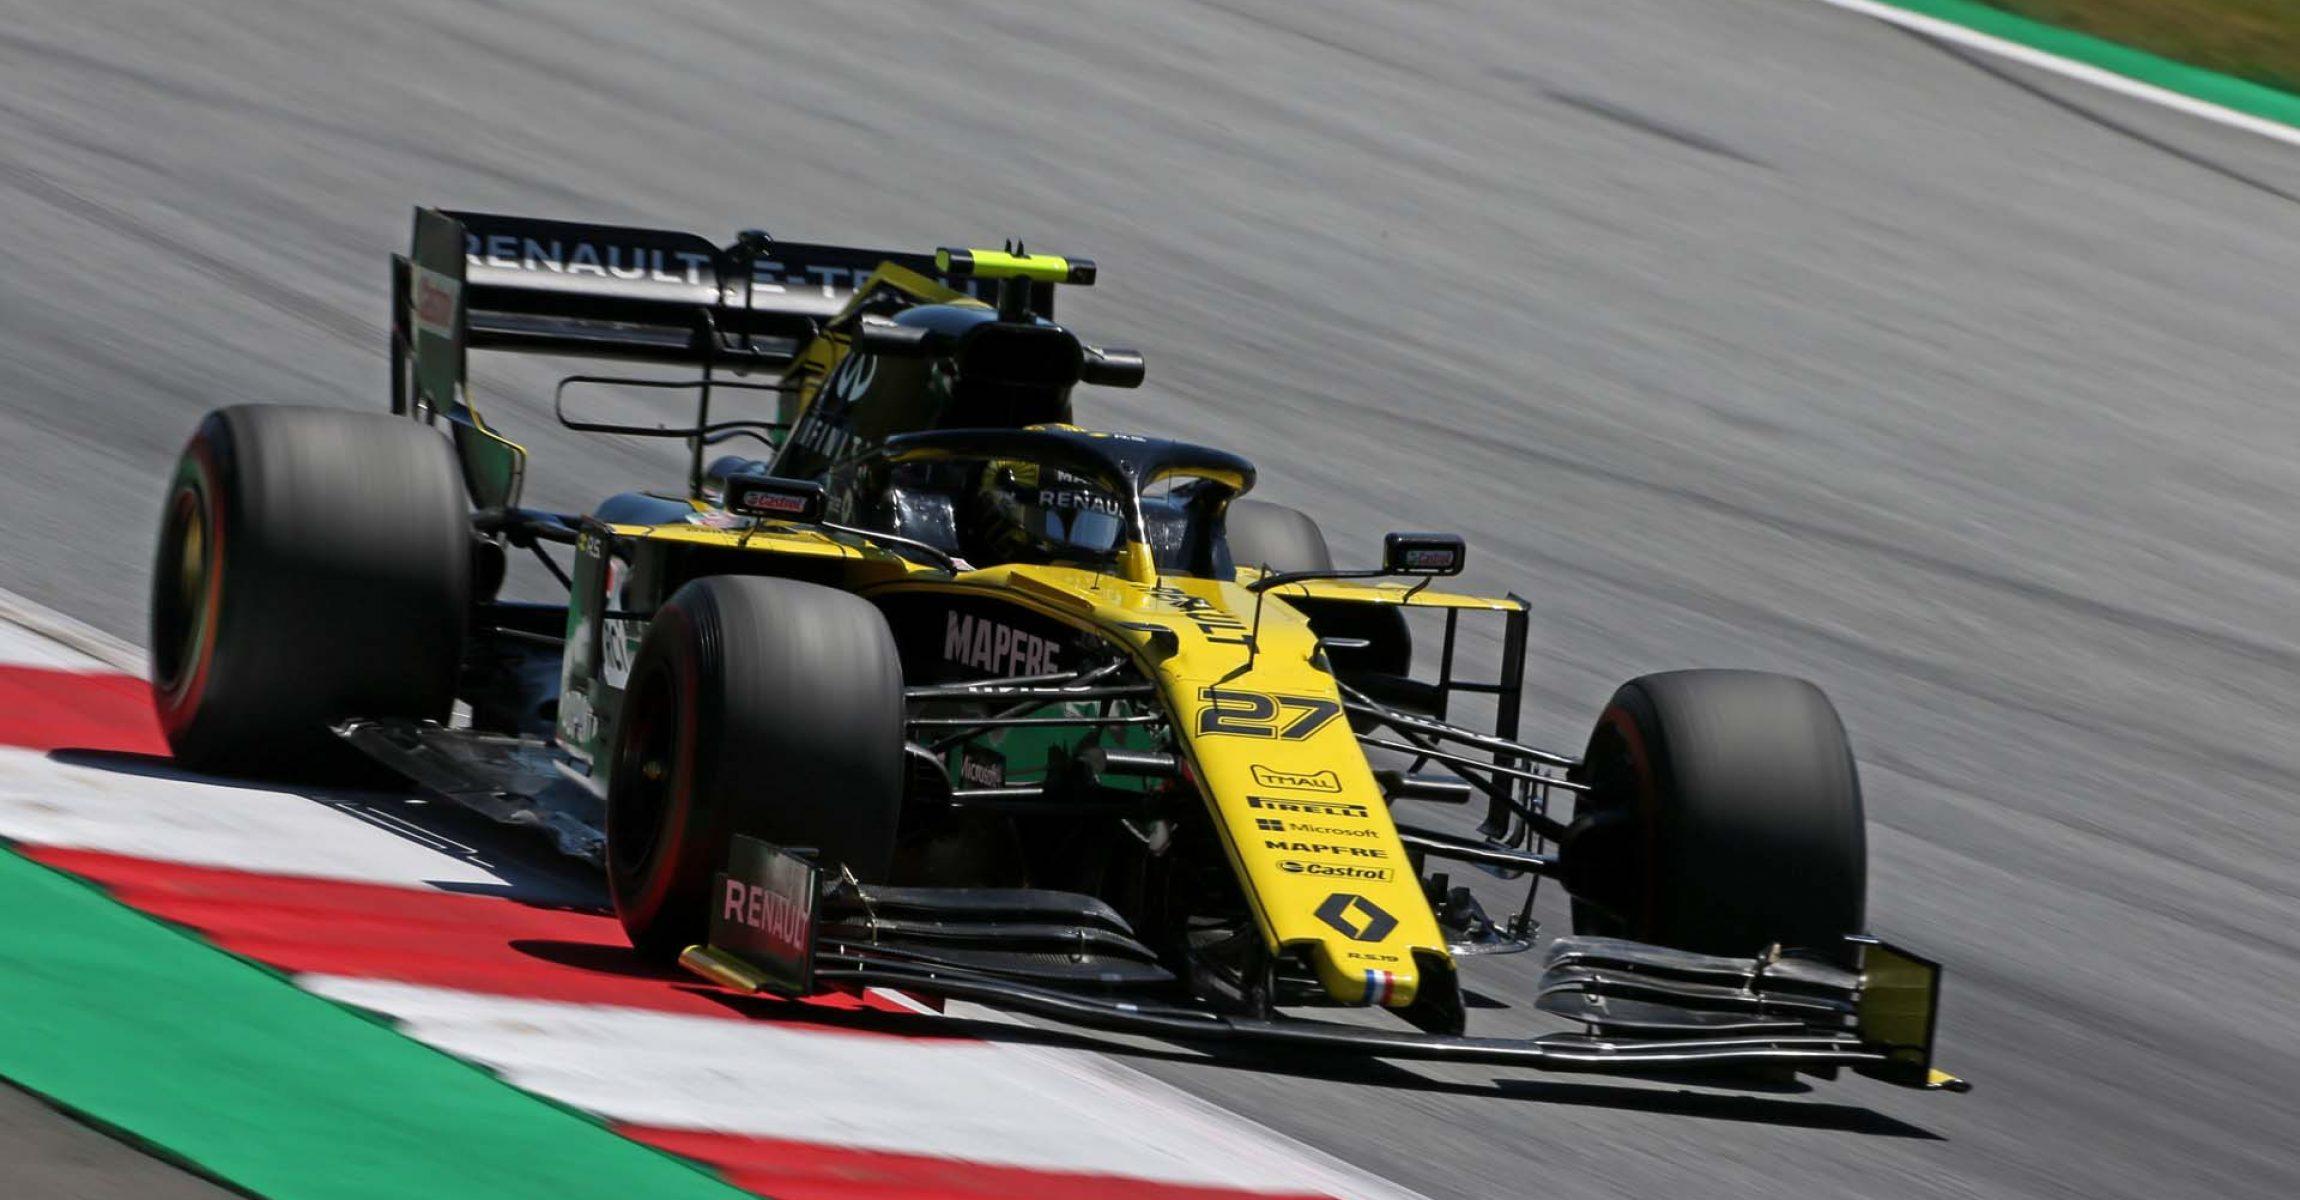 Nico Hulkenberg (GER) Renault F1 Team RS19. Hülkenberg Austrian Grand Prix, Friday 28th June 2019. Spielberg, Austria.